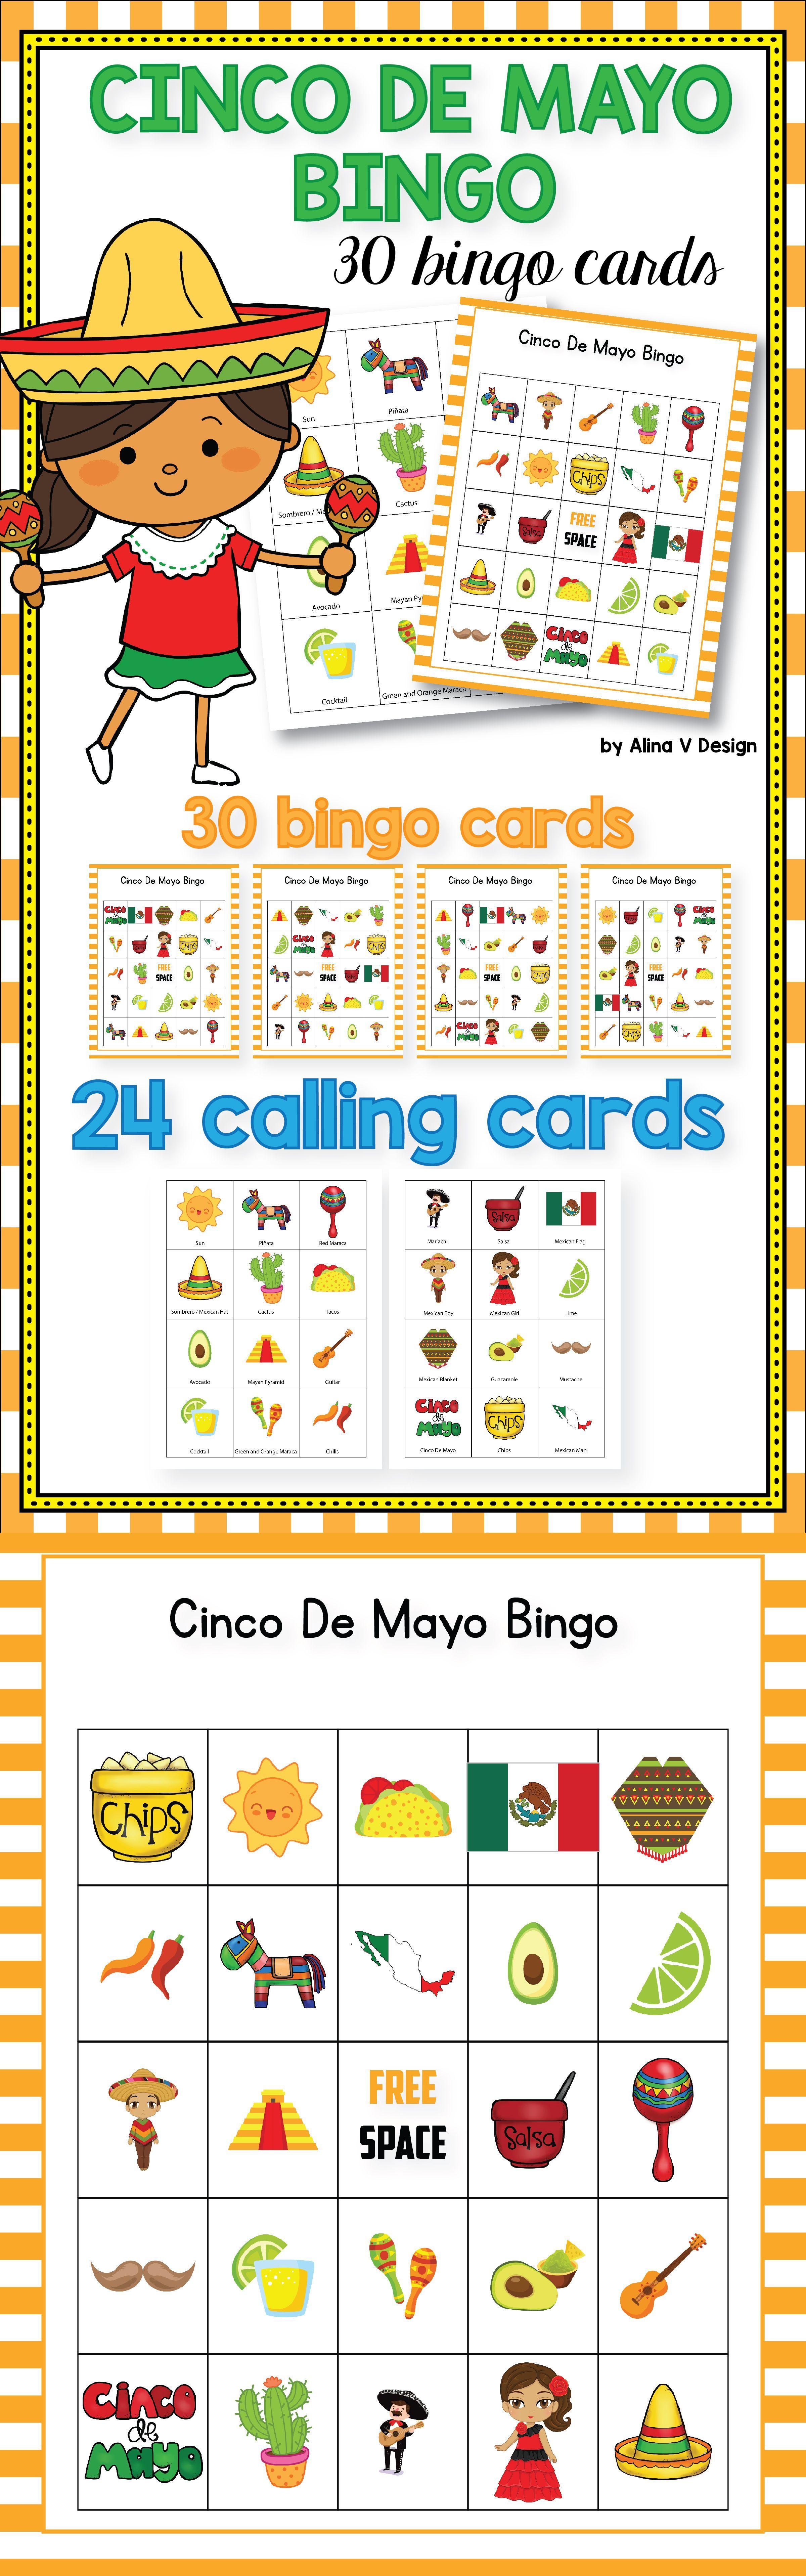 Cinco De Mayo Bingo Printable Is The Perfect Activity For